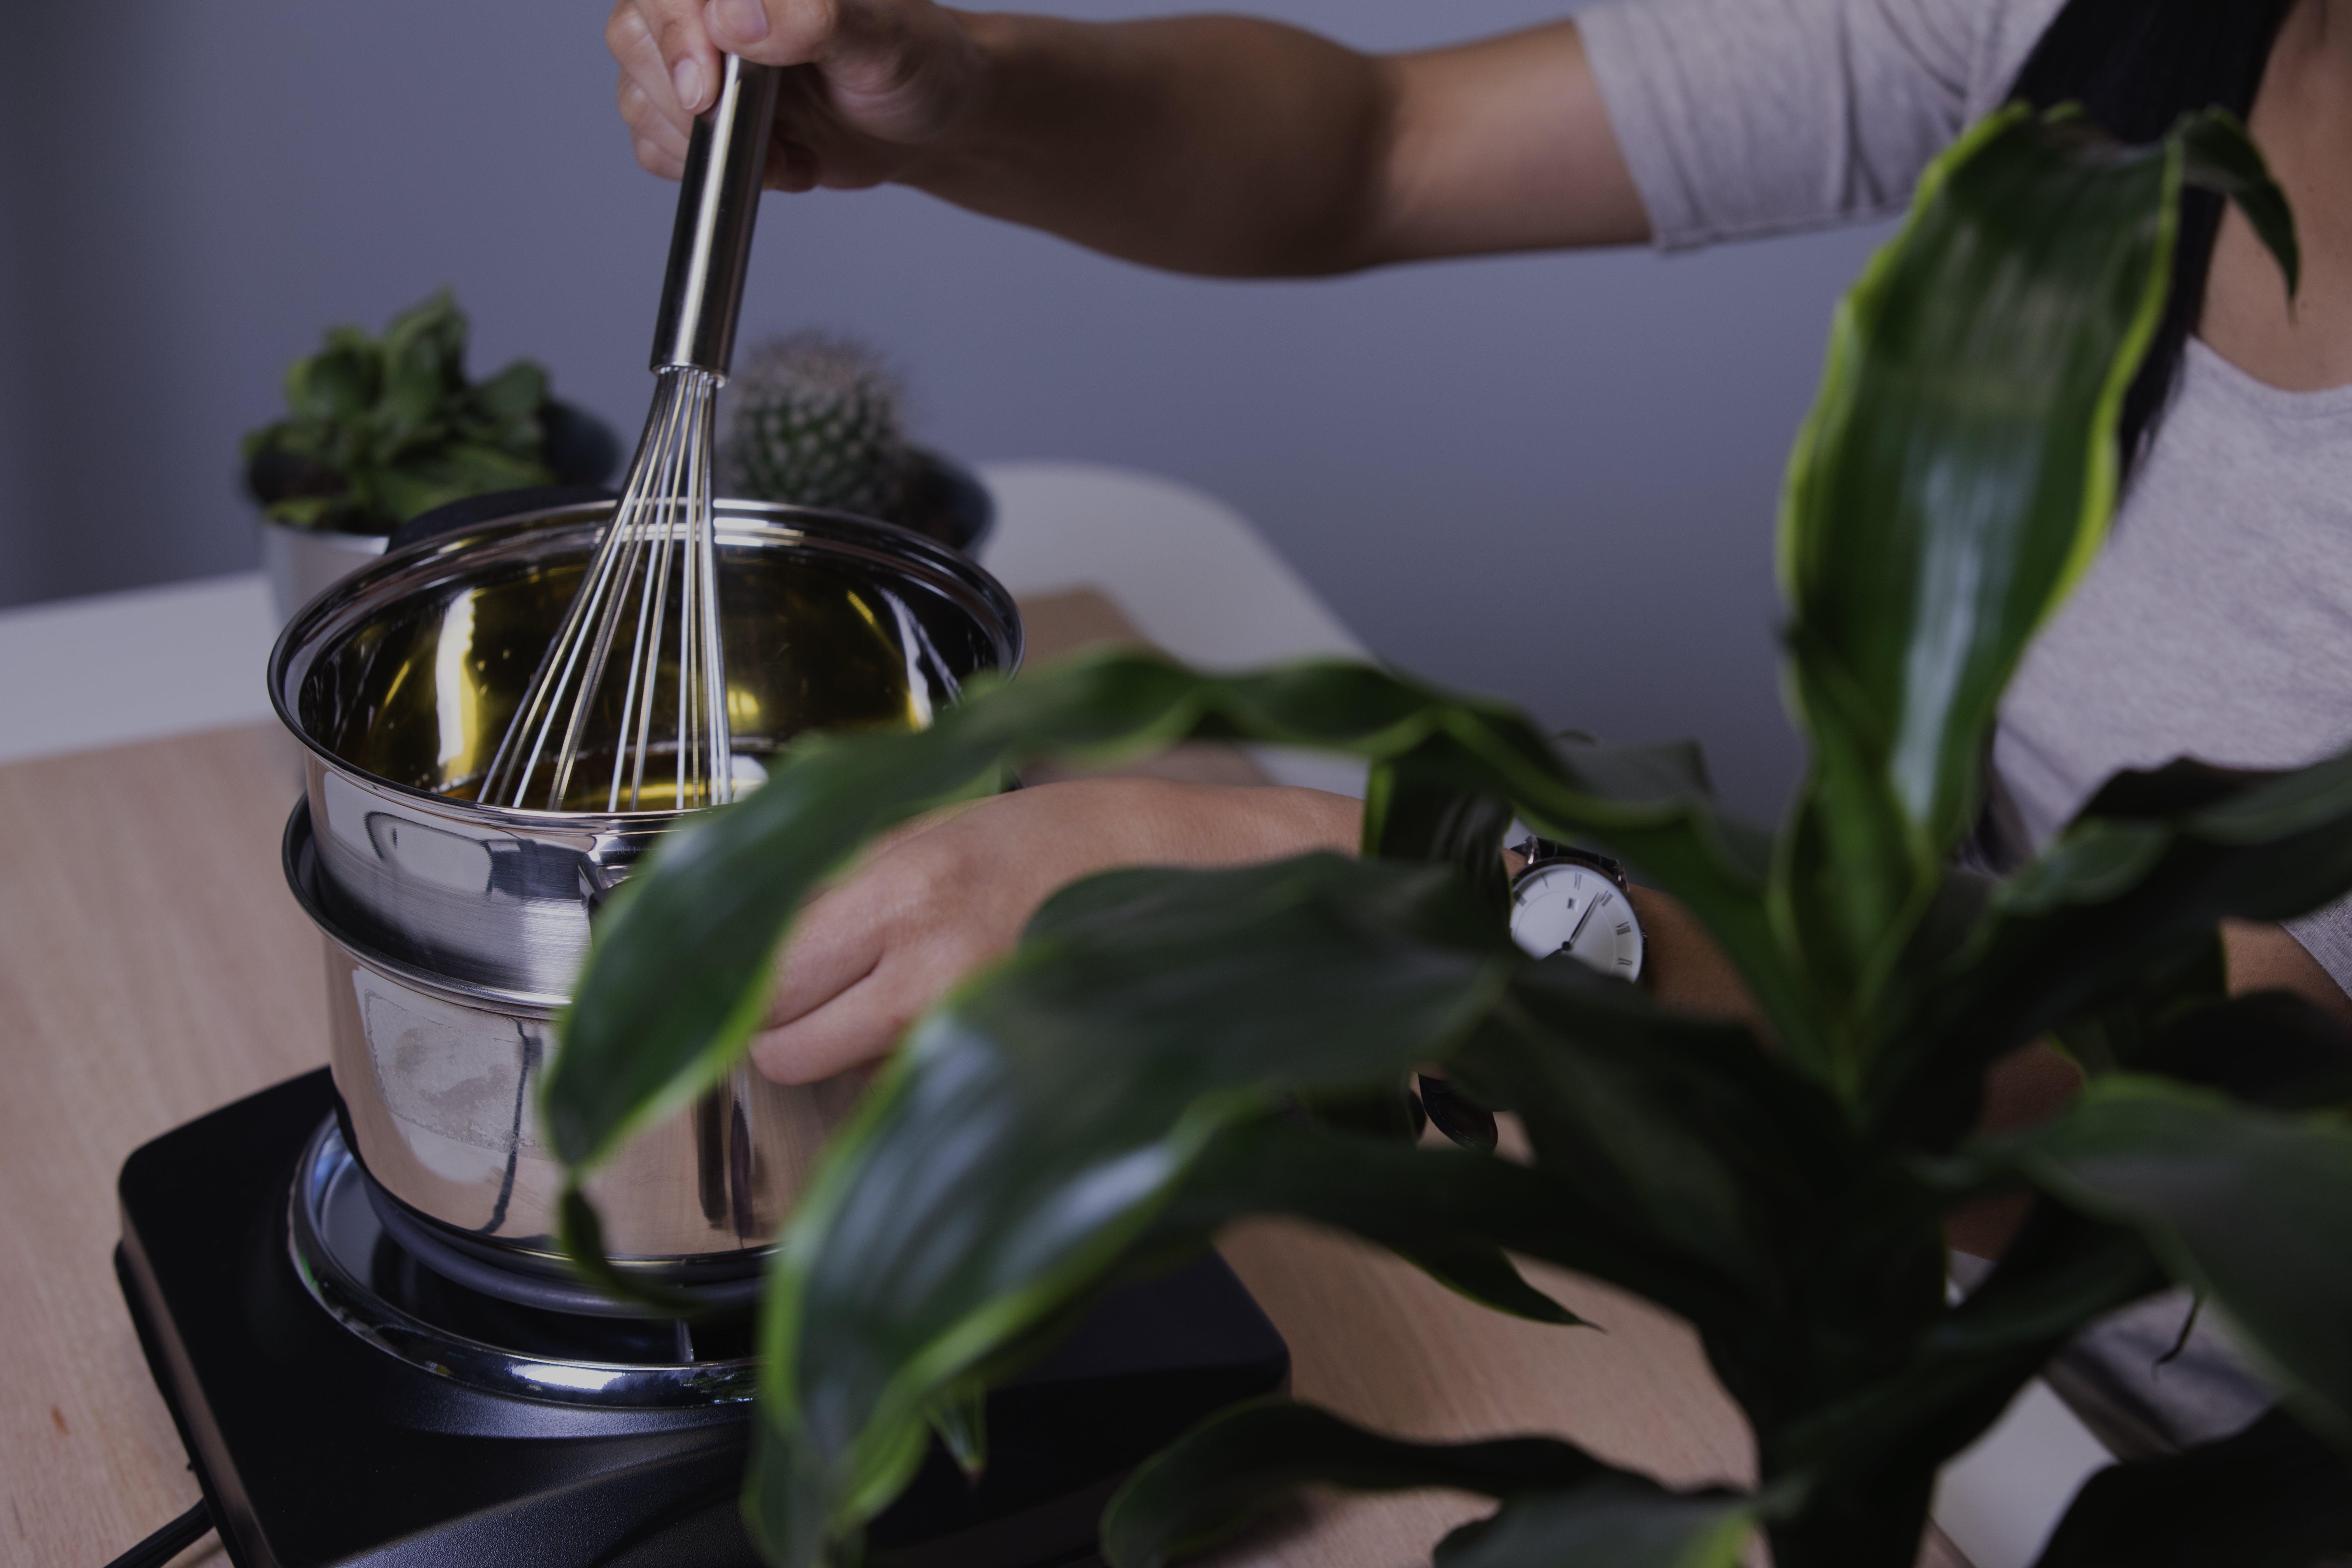 CBD Lotion Recipe How to Make CBD Cream At Home 05 CBD Lotion Recipe: How to Make CBD Cream At Home